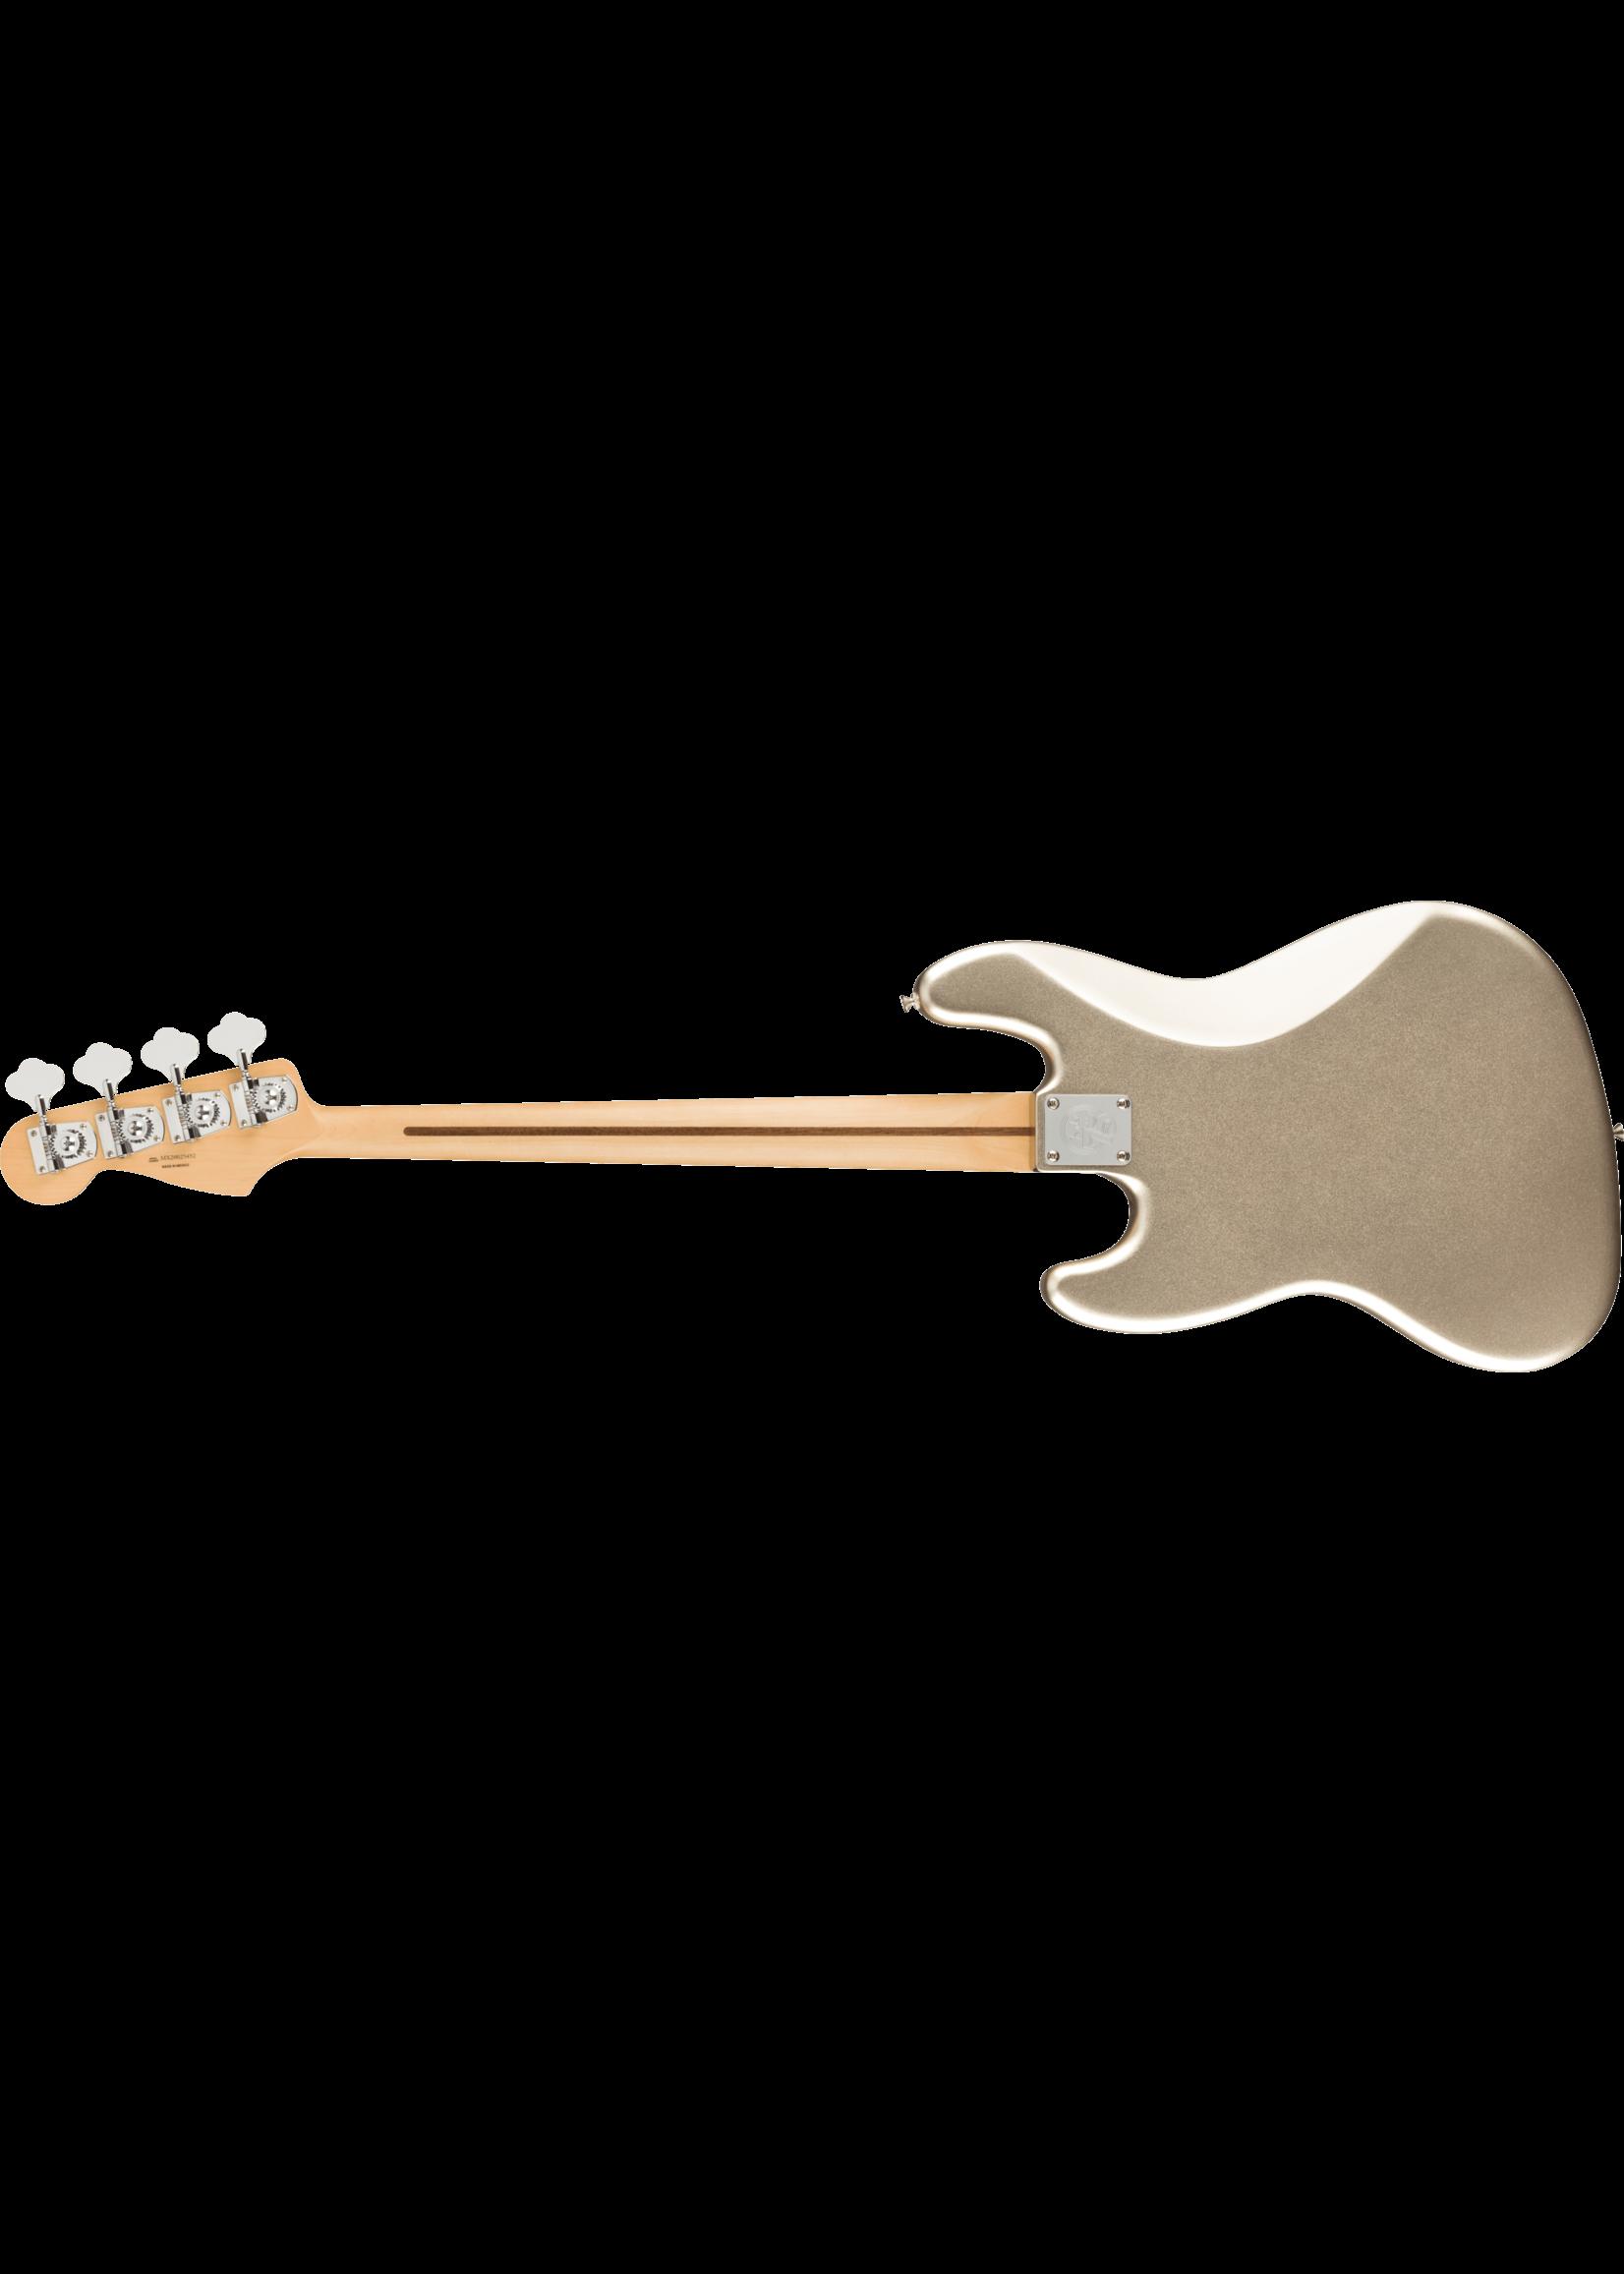 Fender Fender 75th Anniversary Jazz Bass Diamond Anniversary